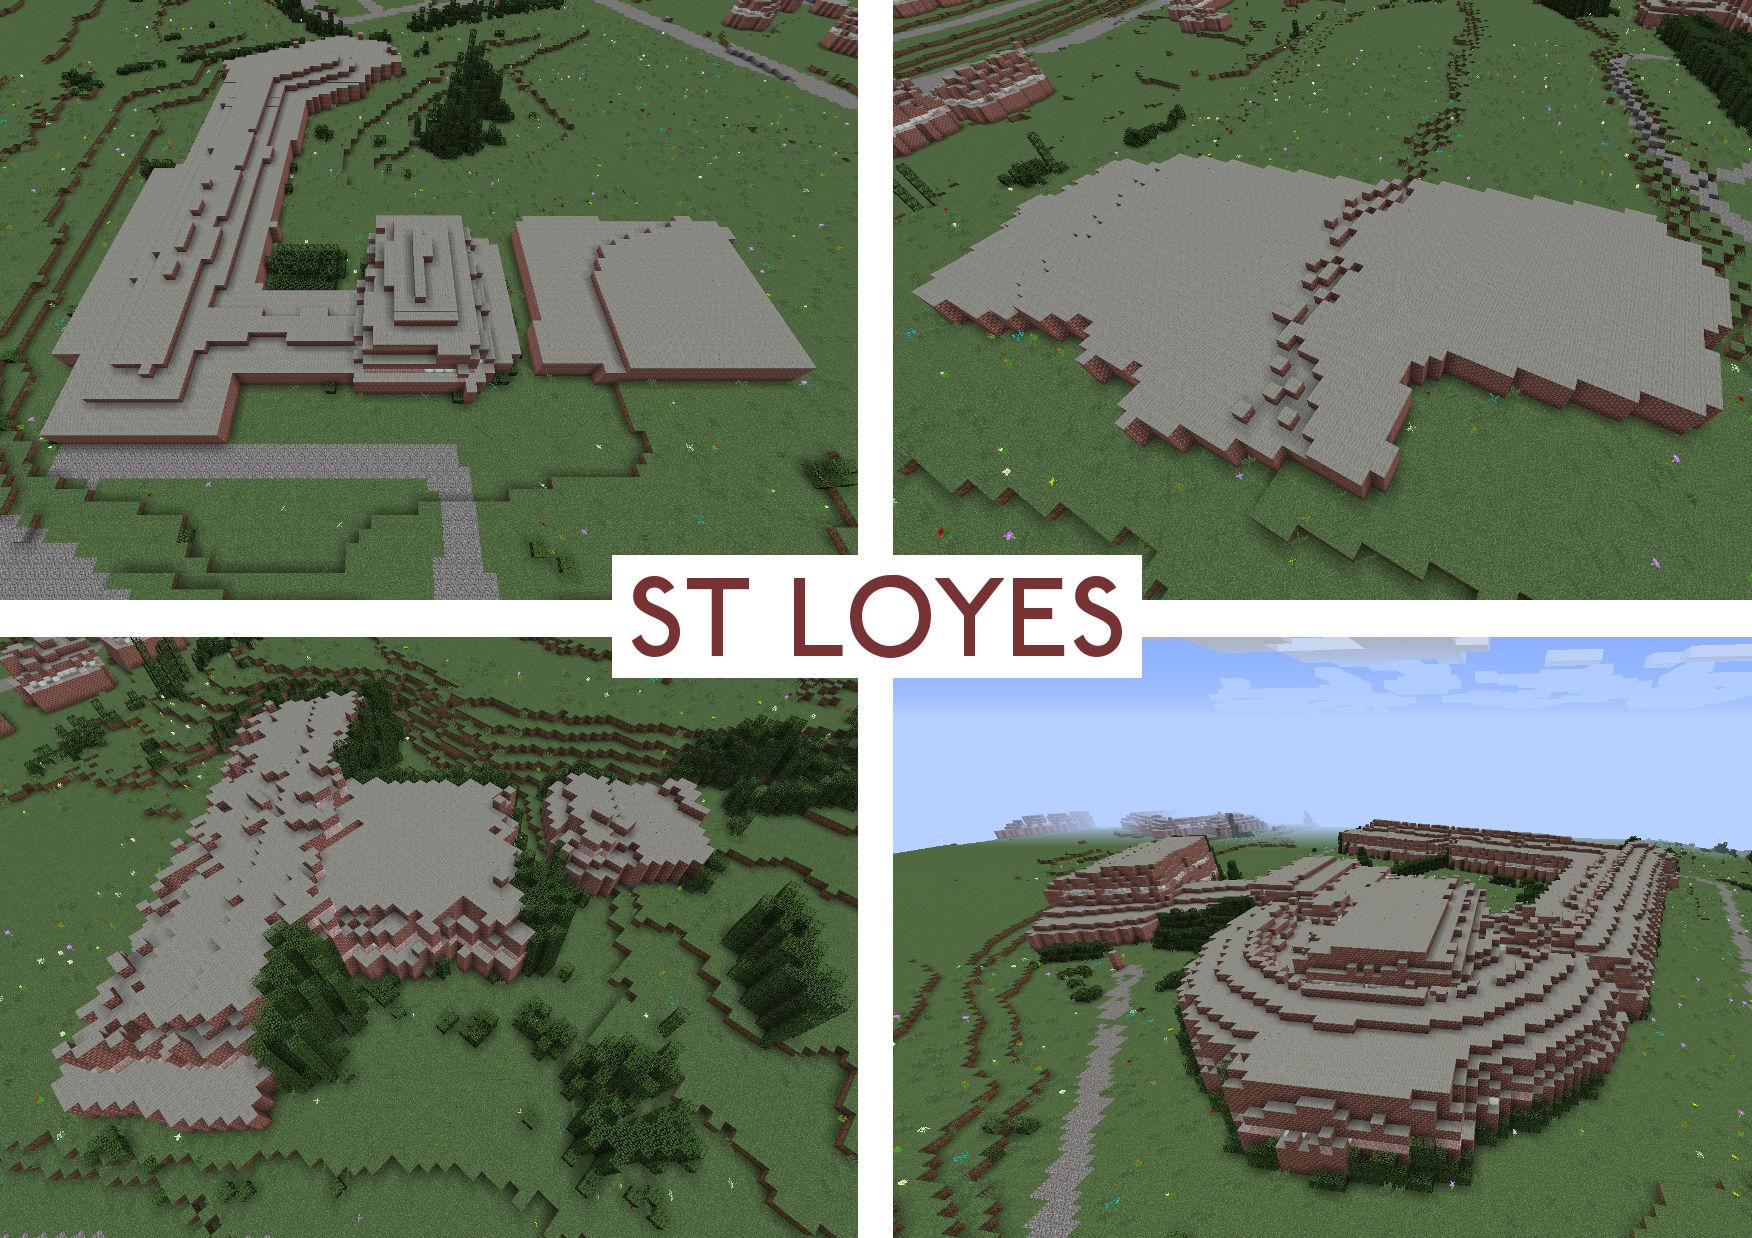 St Loyes schools